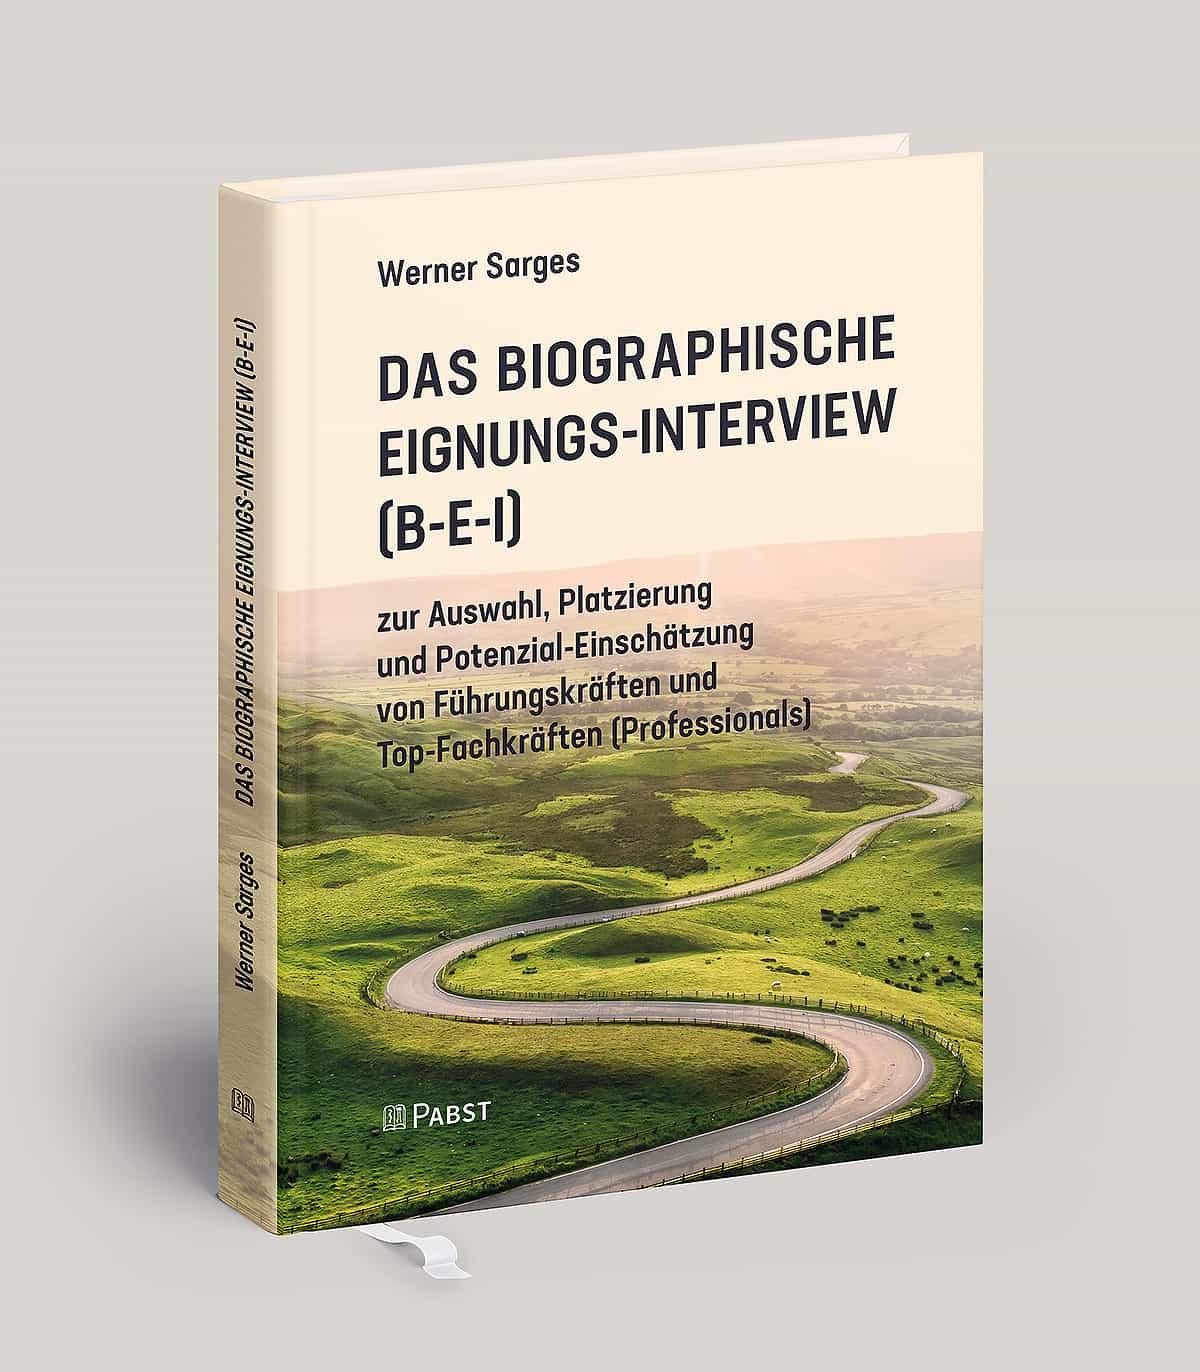 Biographisches Interview B-E-I Buch-Mockup